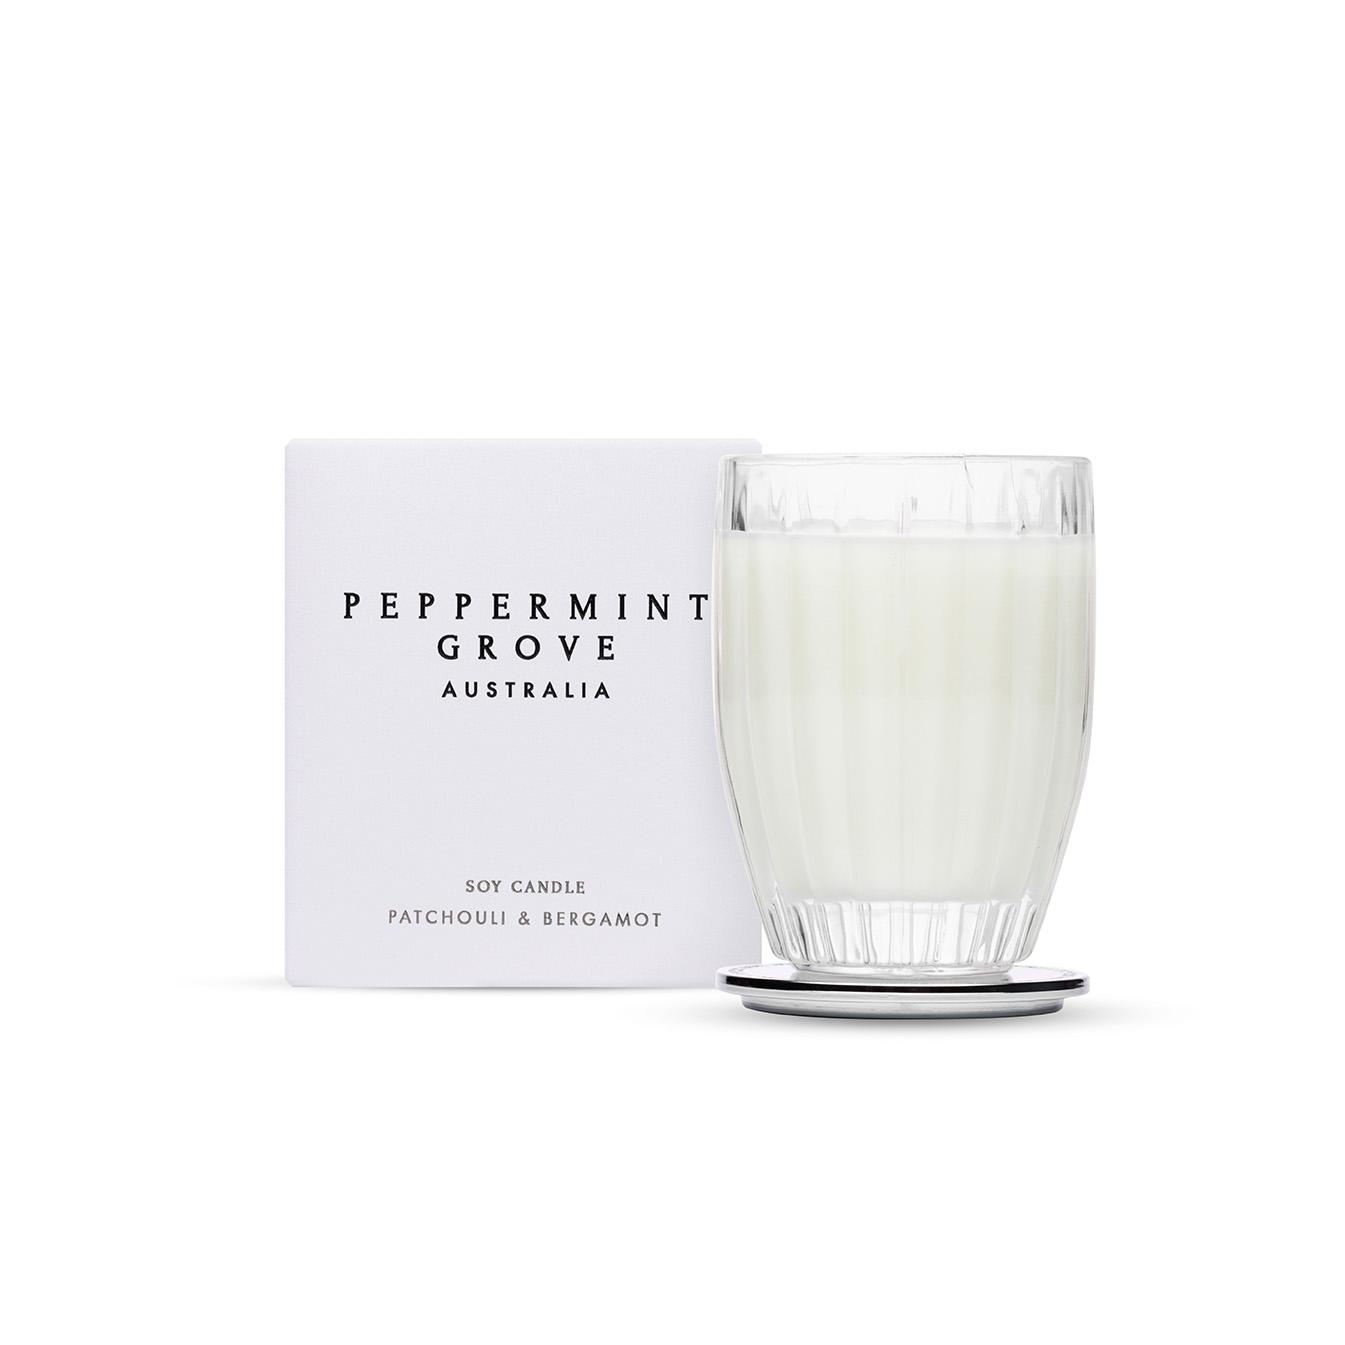 Patchouli & Bergamot - Medium Glass Candle Jar